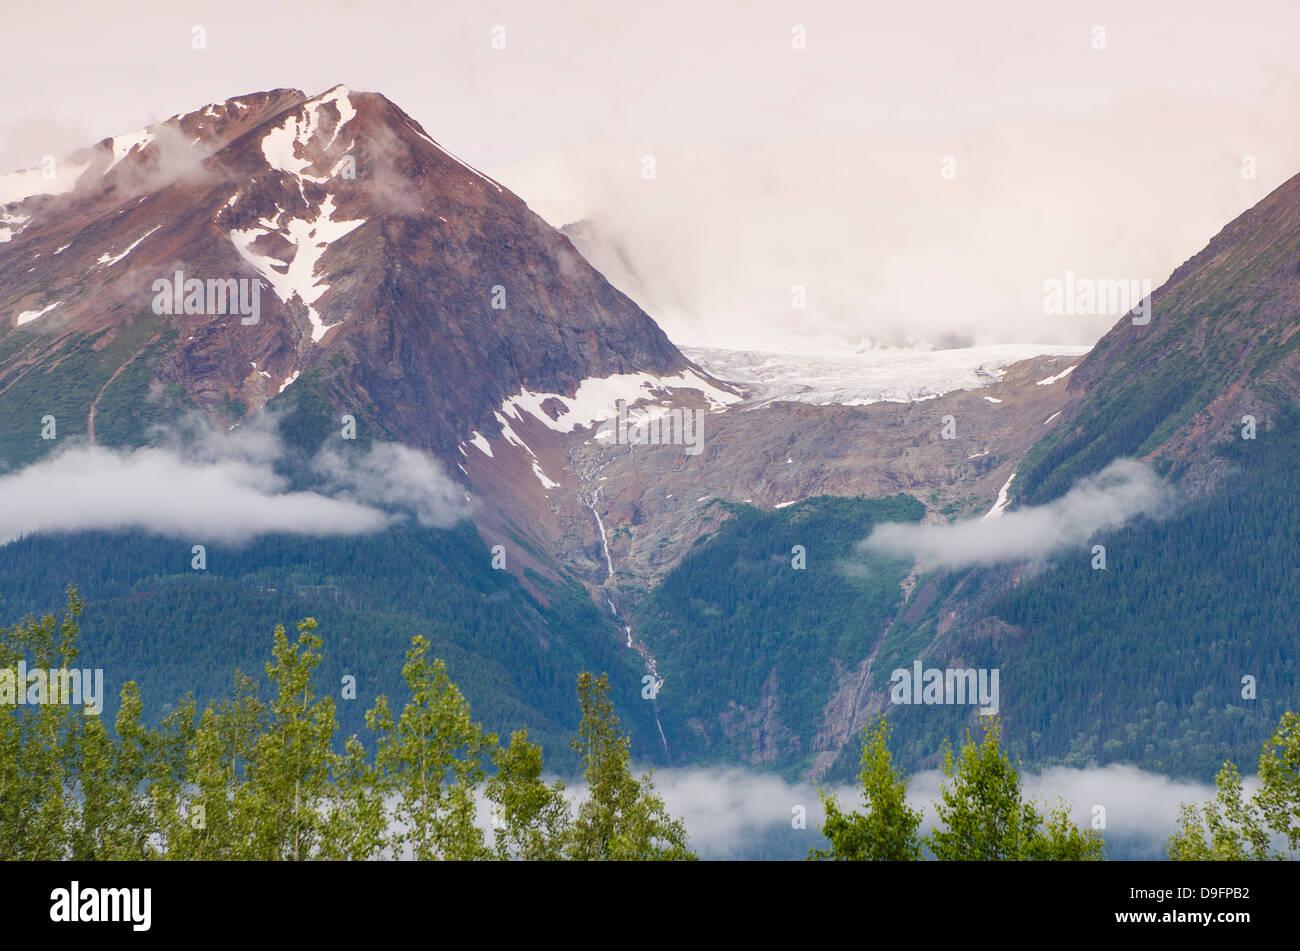 Hudson Bay Mountain and Kathlyn Glacier, Smithers, British Columbia, Canada - Stock Image